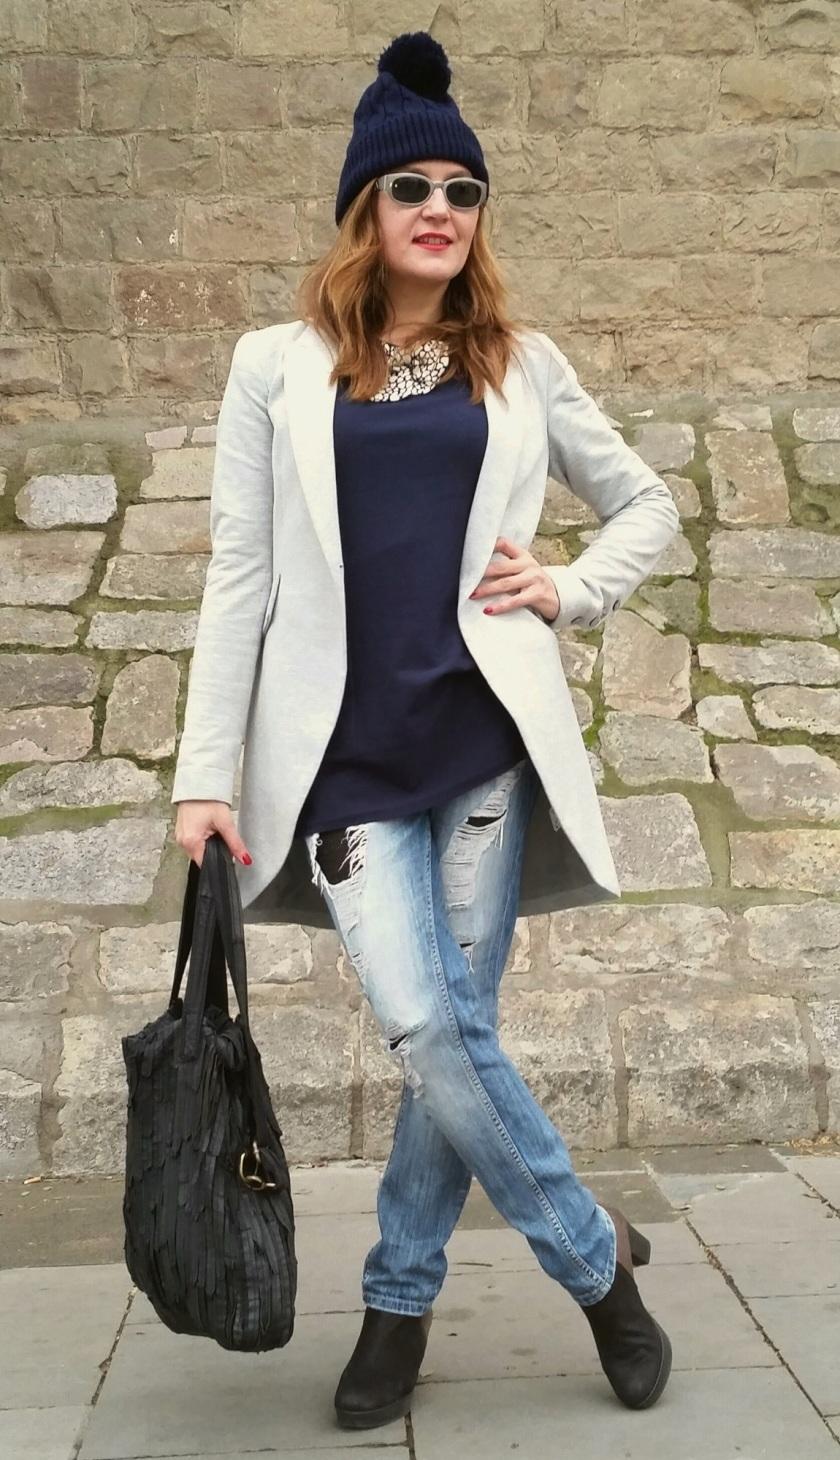 Cuida de ti, cuida tu imagen, 080 Barcelona Fashion, Street Style, What I wore